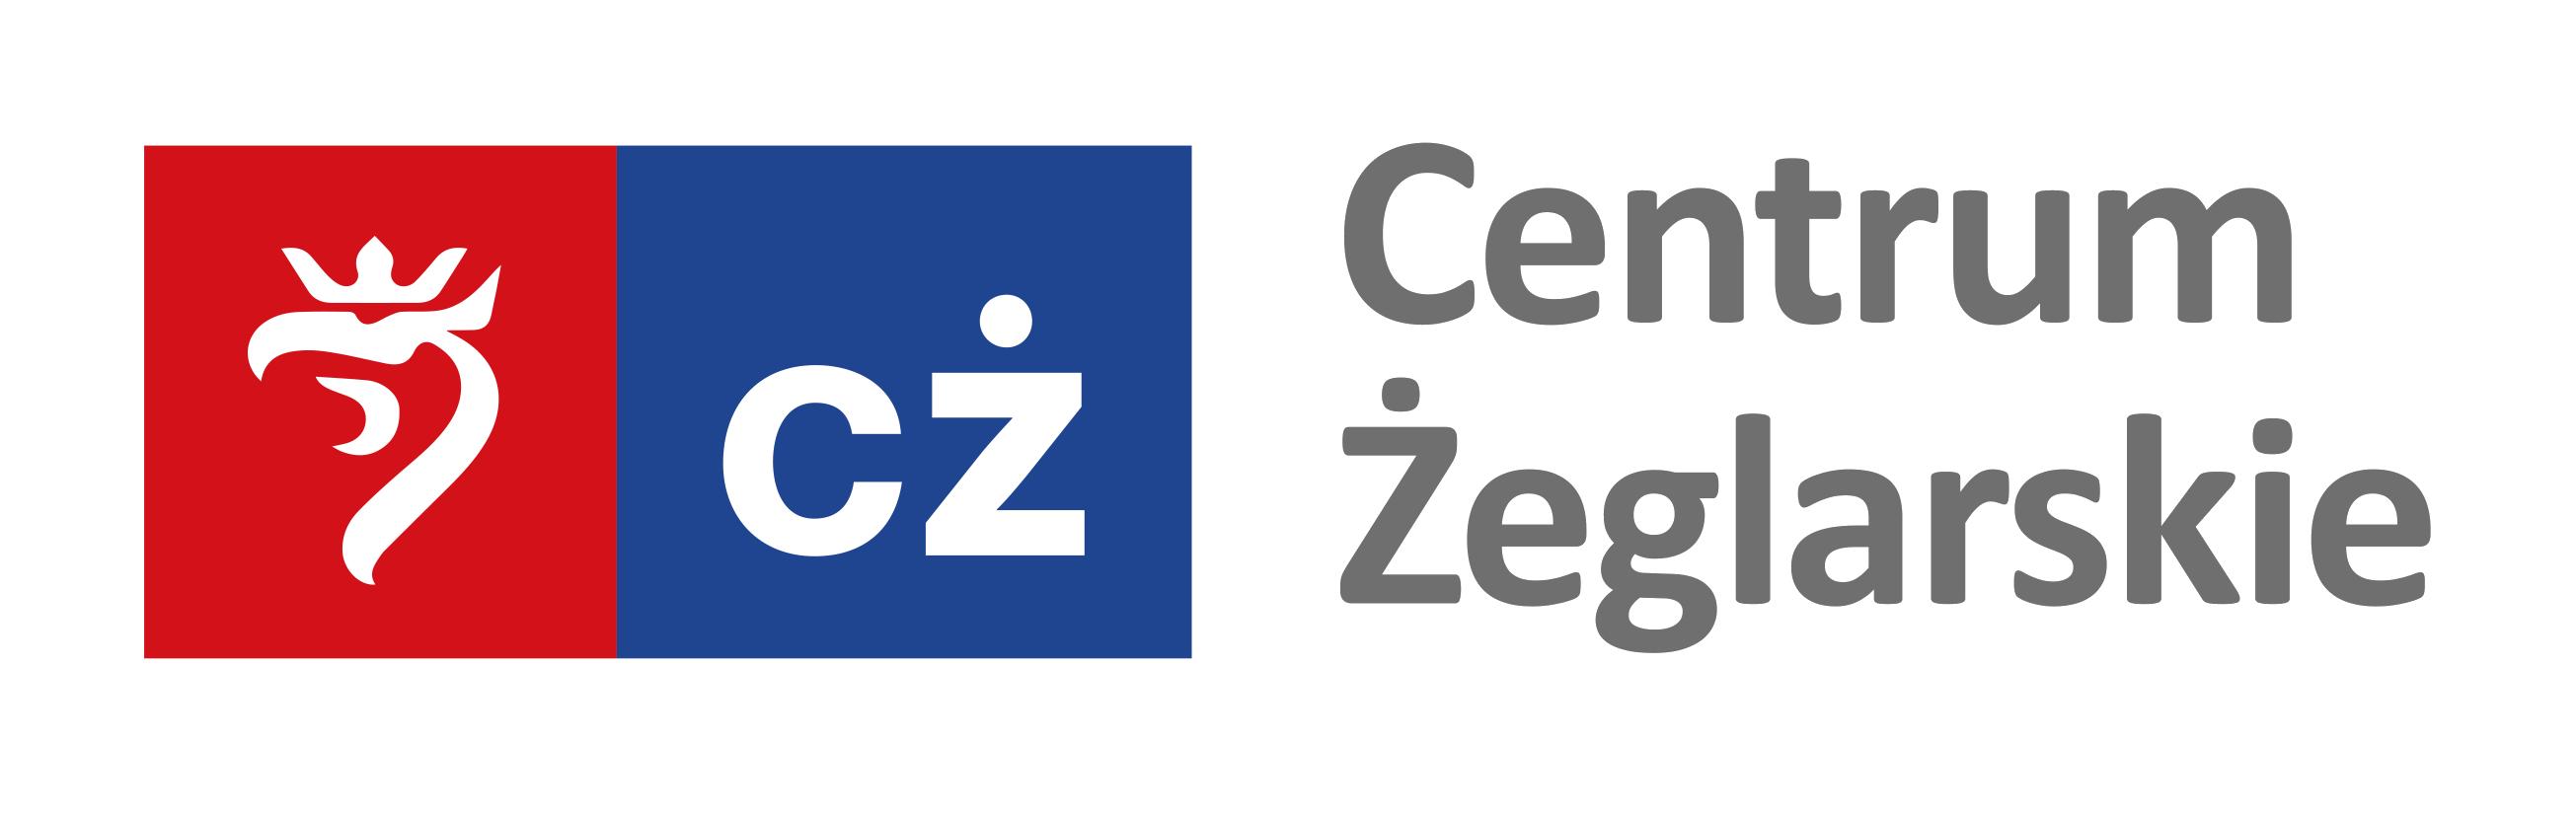 Centrum Żeglarskie